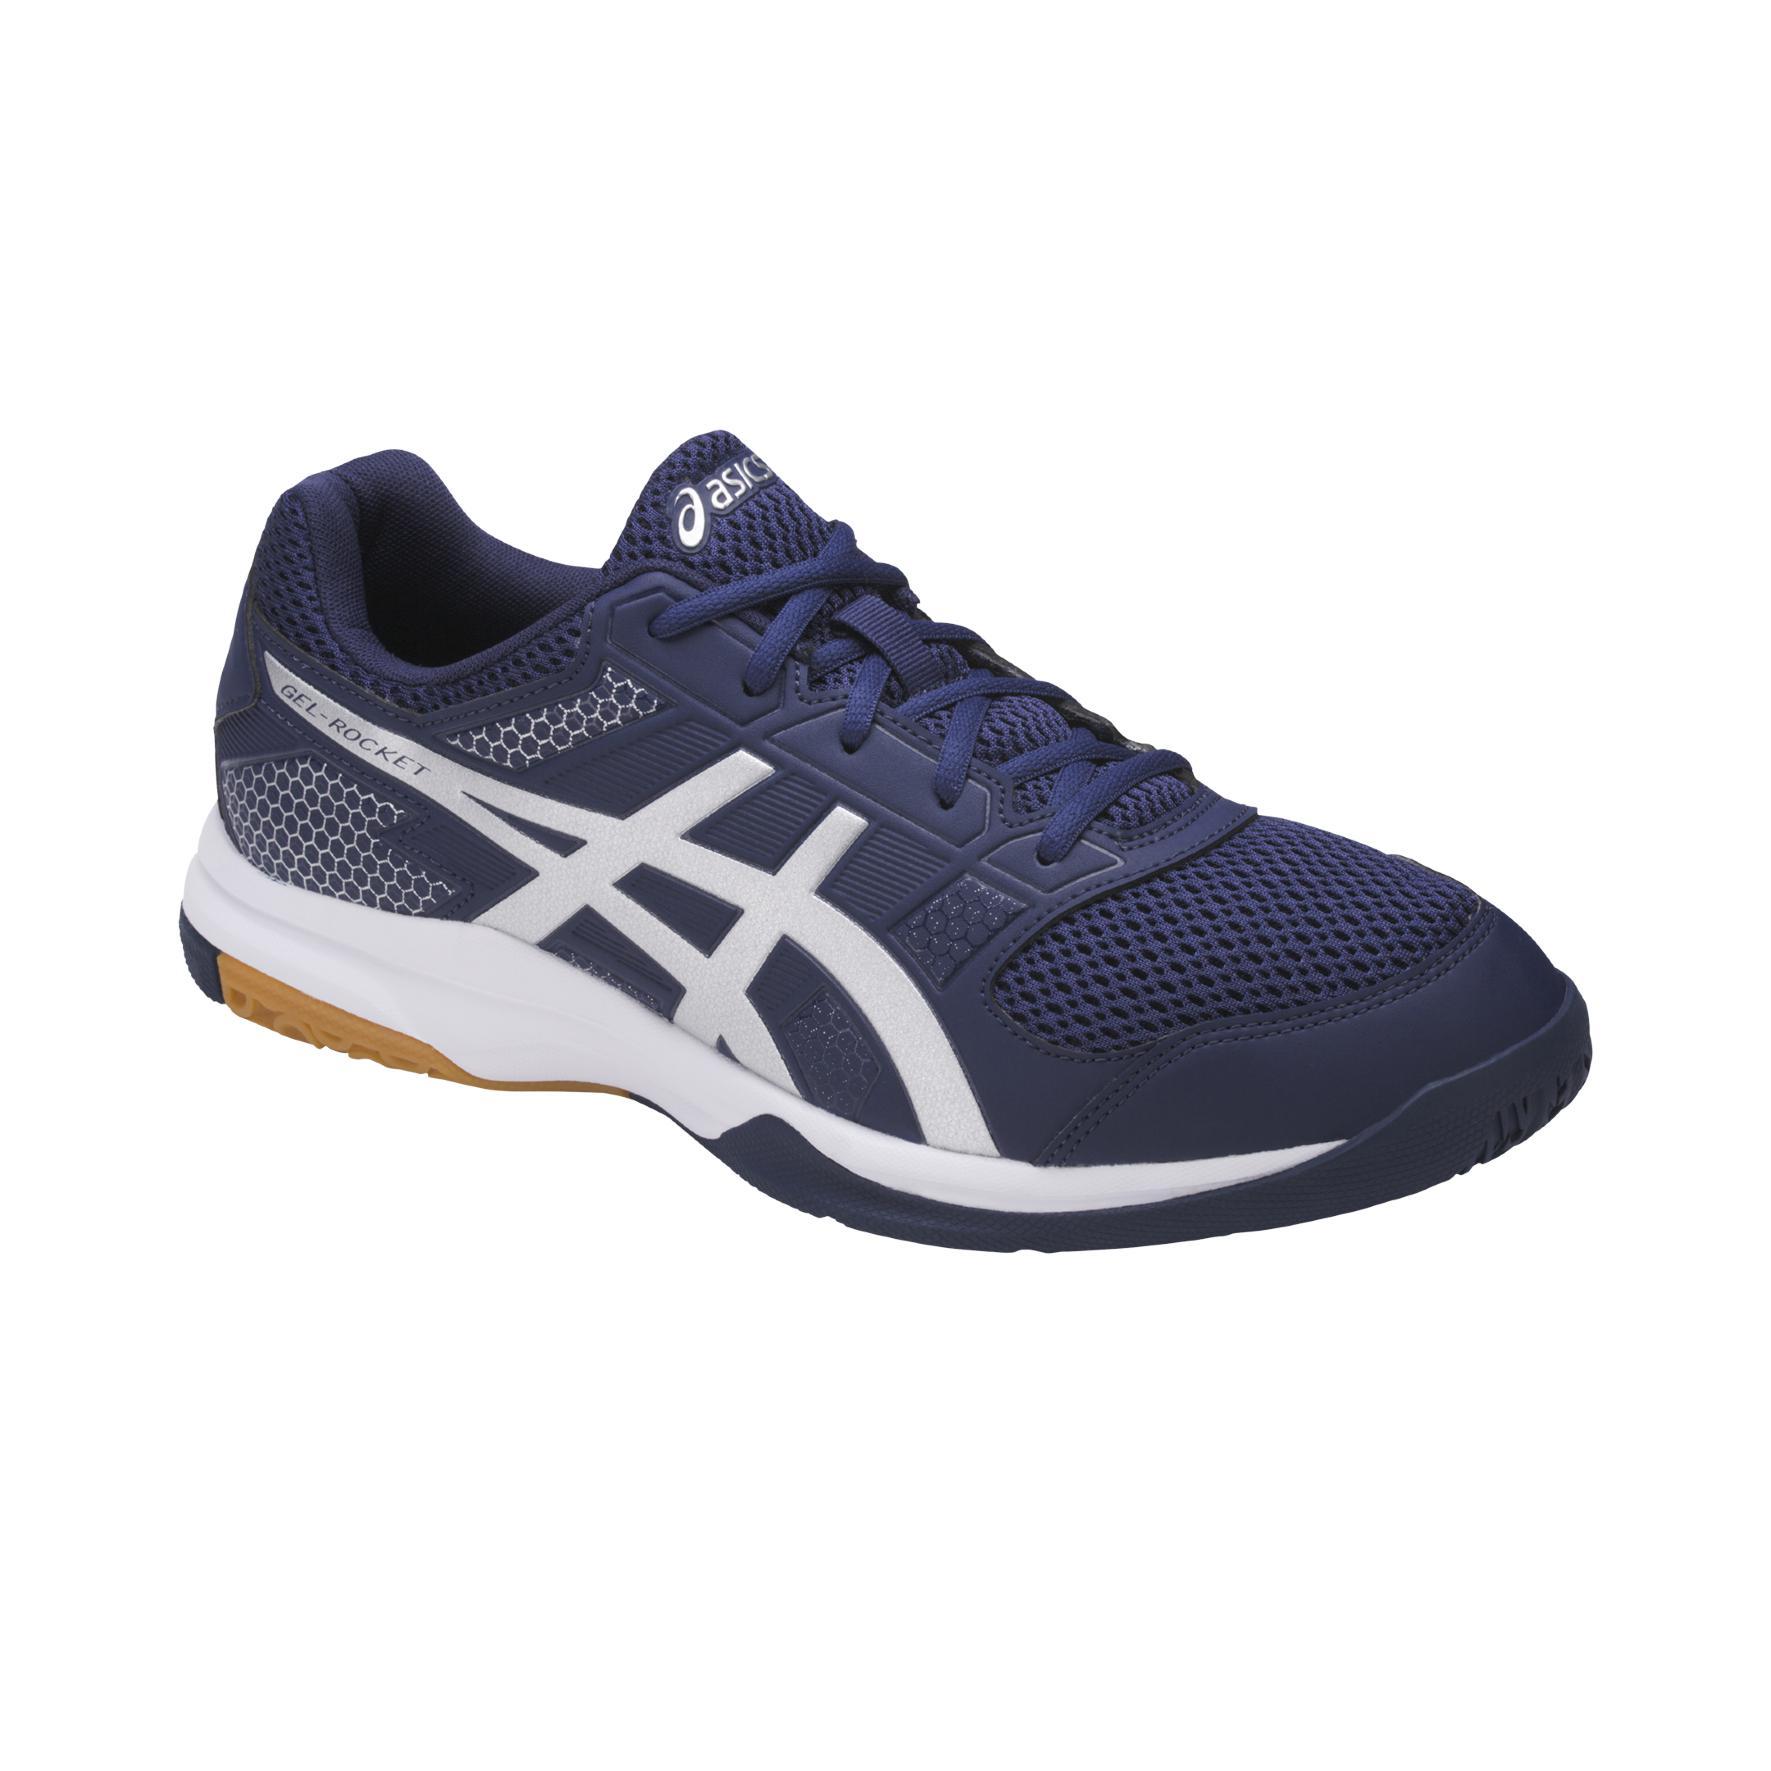 asics mens gel rocket 8 squash shoes 2017 just squash